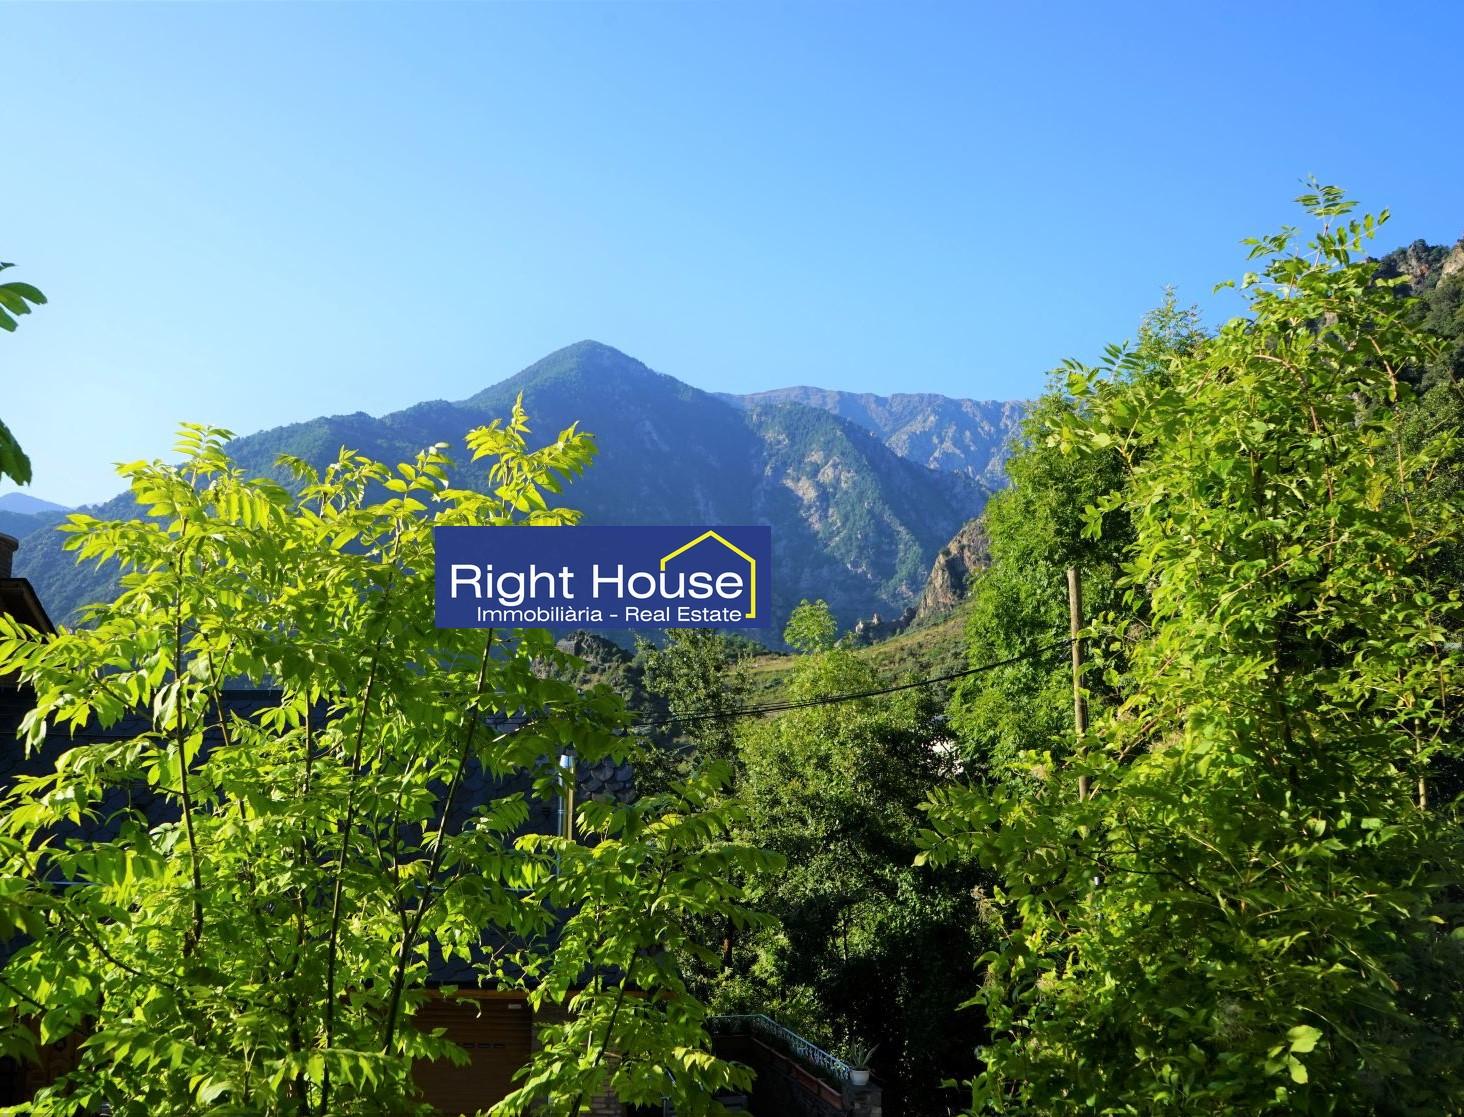 Terreny en venda a Nagol, 377 metres